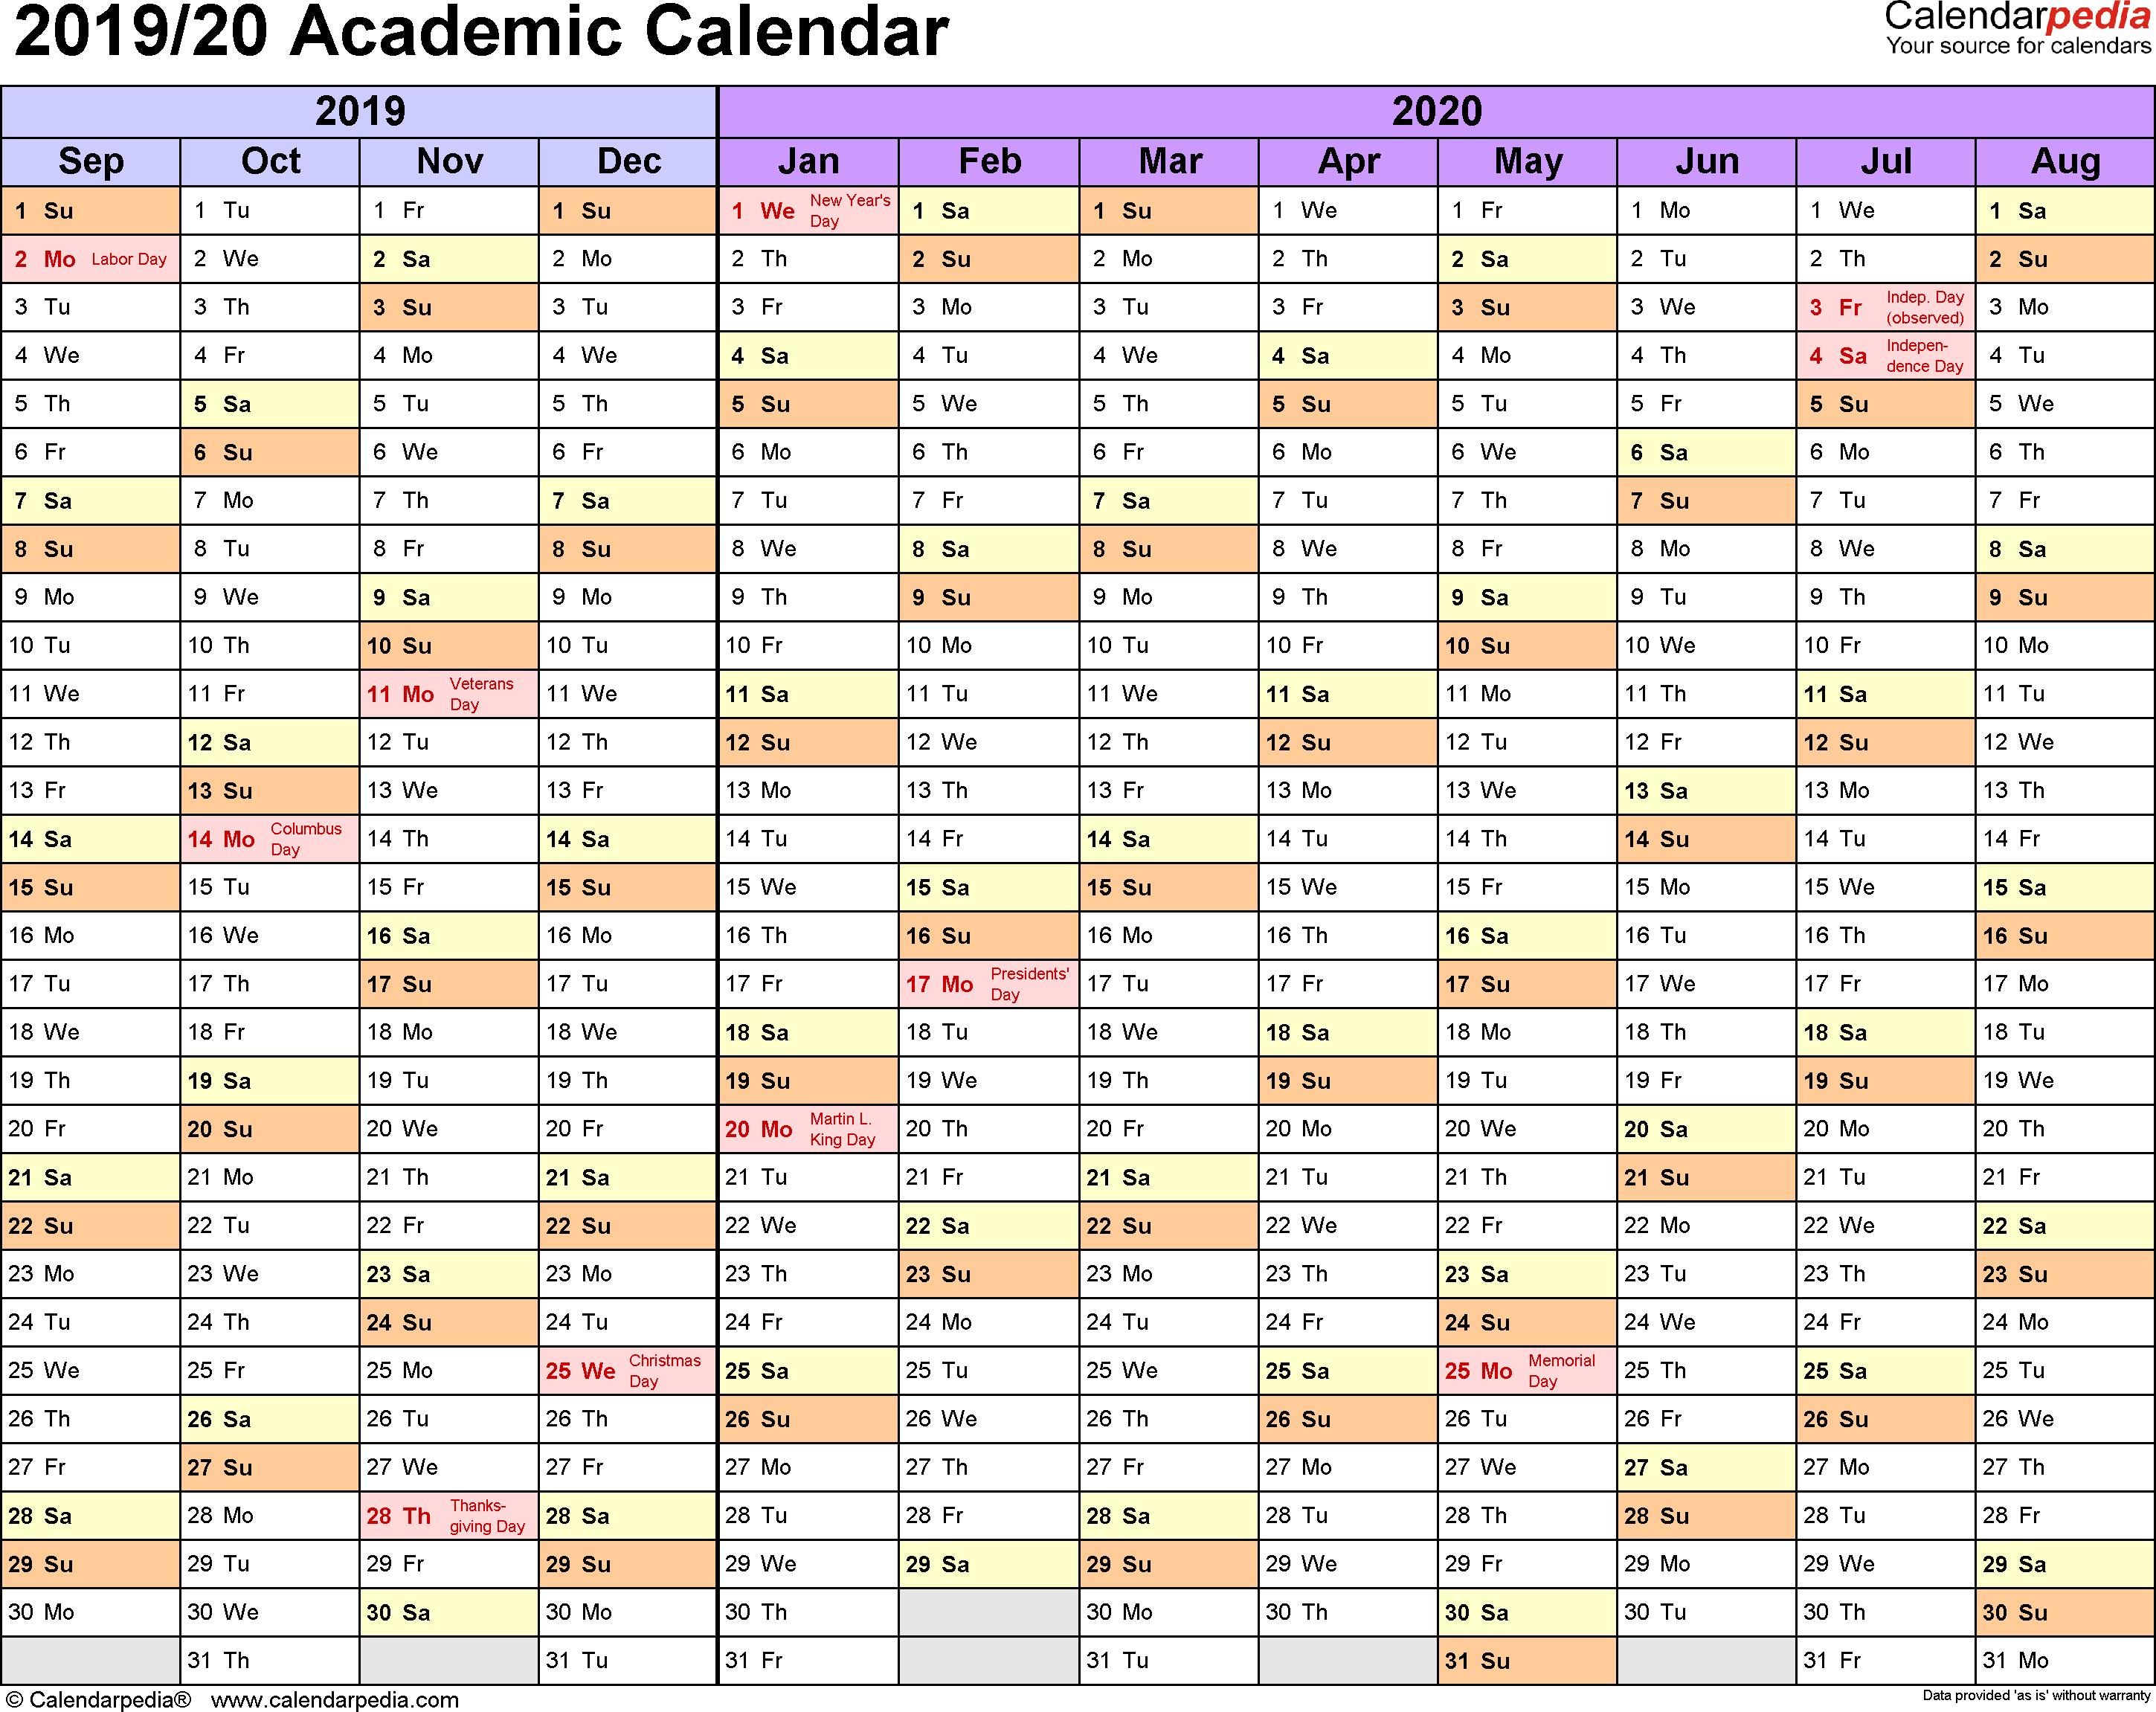 Calendar 2020 Egypt